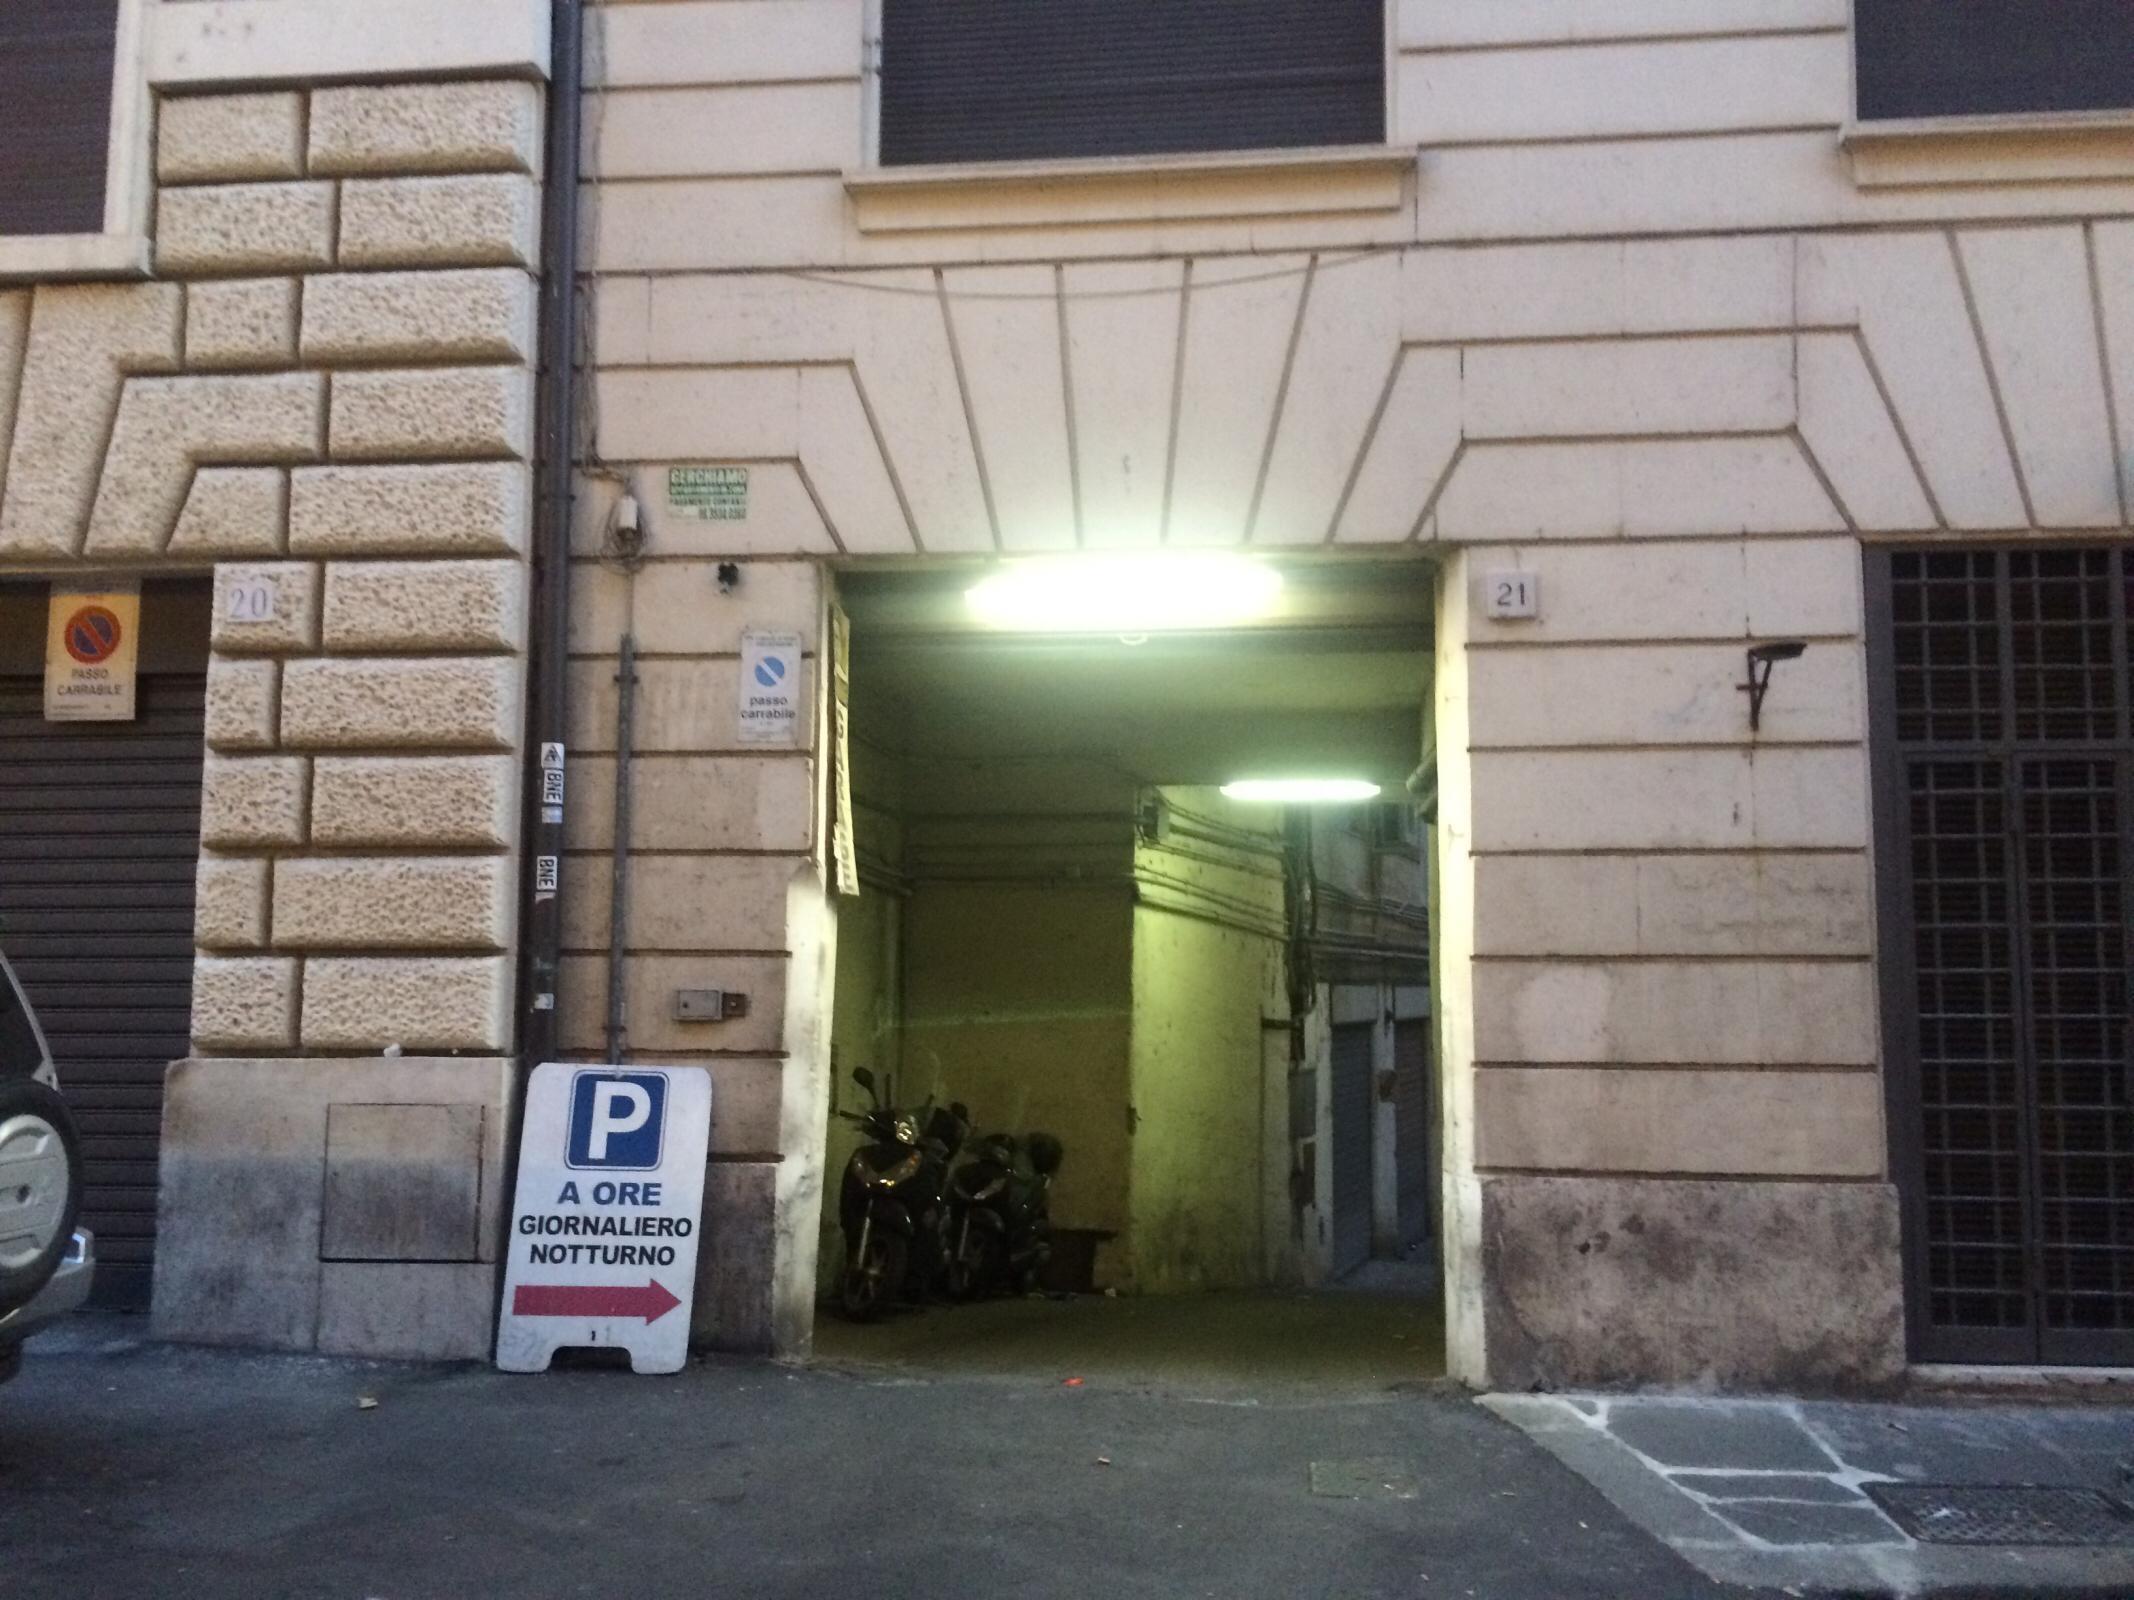 Via Paola 21 Garage Parking In Roma Parkme